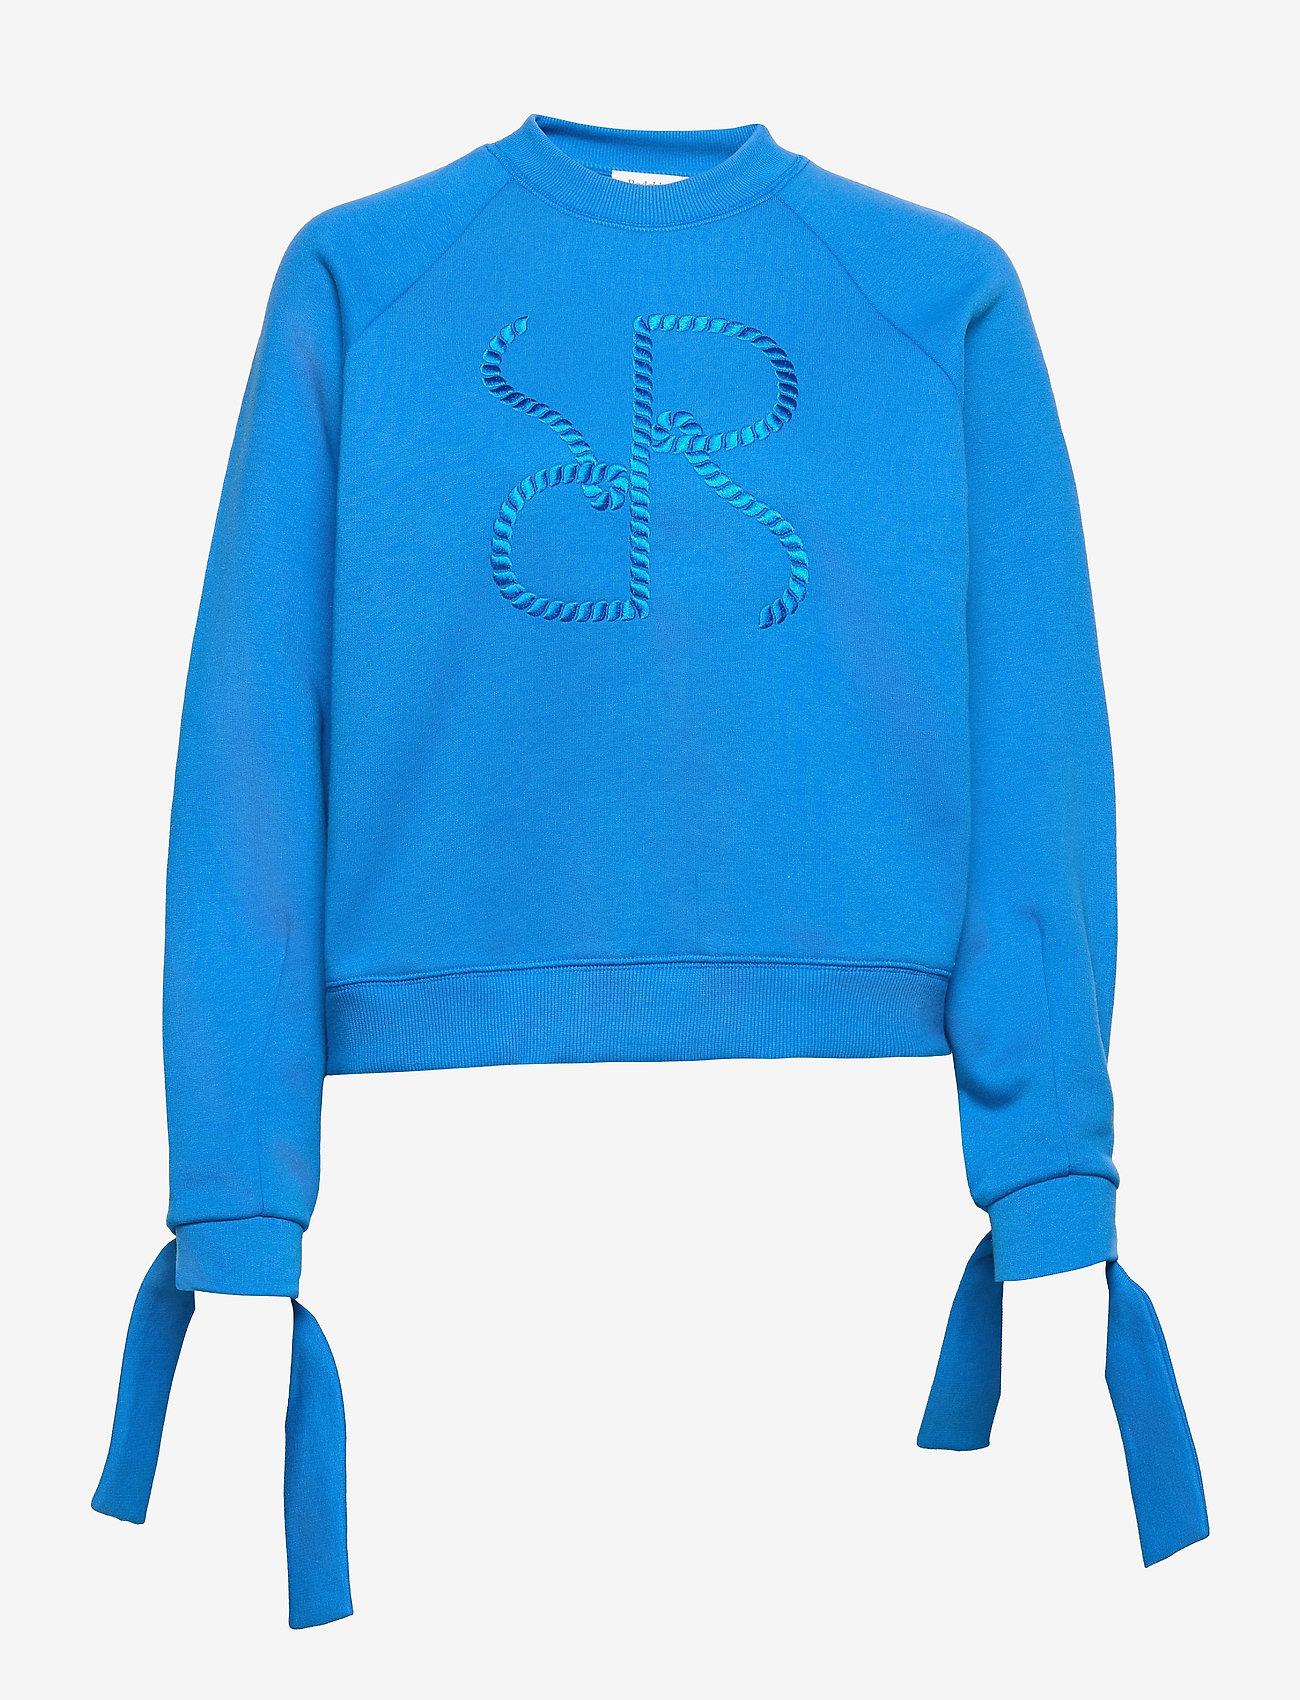 RODEBJER - RODEBJER ZORINA - sweatshirts & hættetrøjer - blue poppy - 0